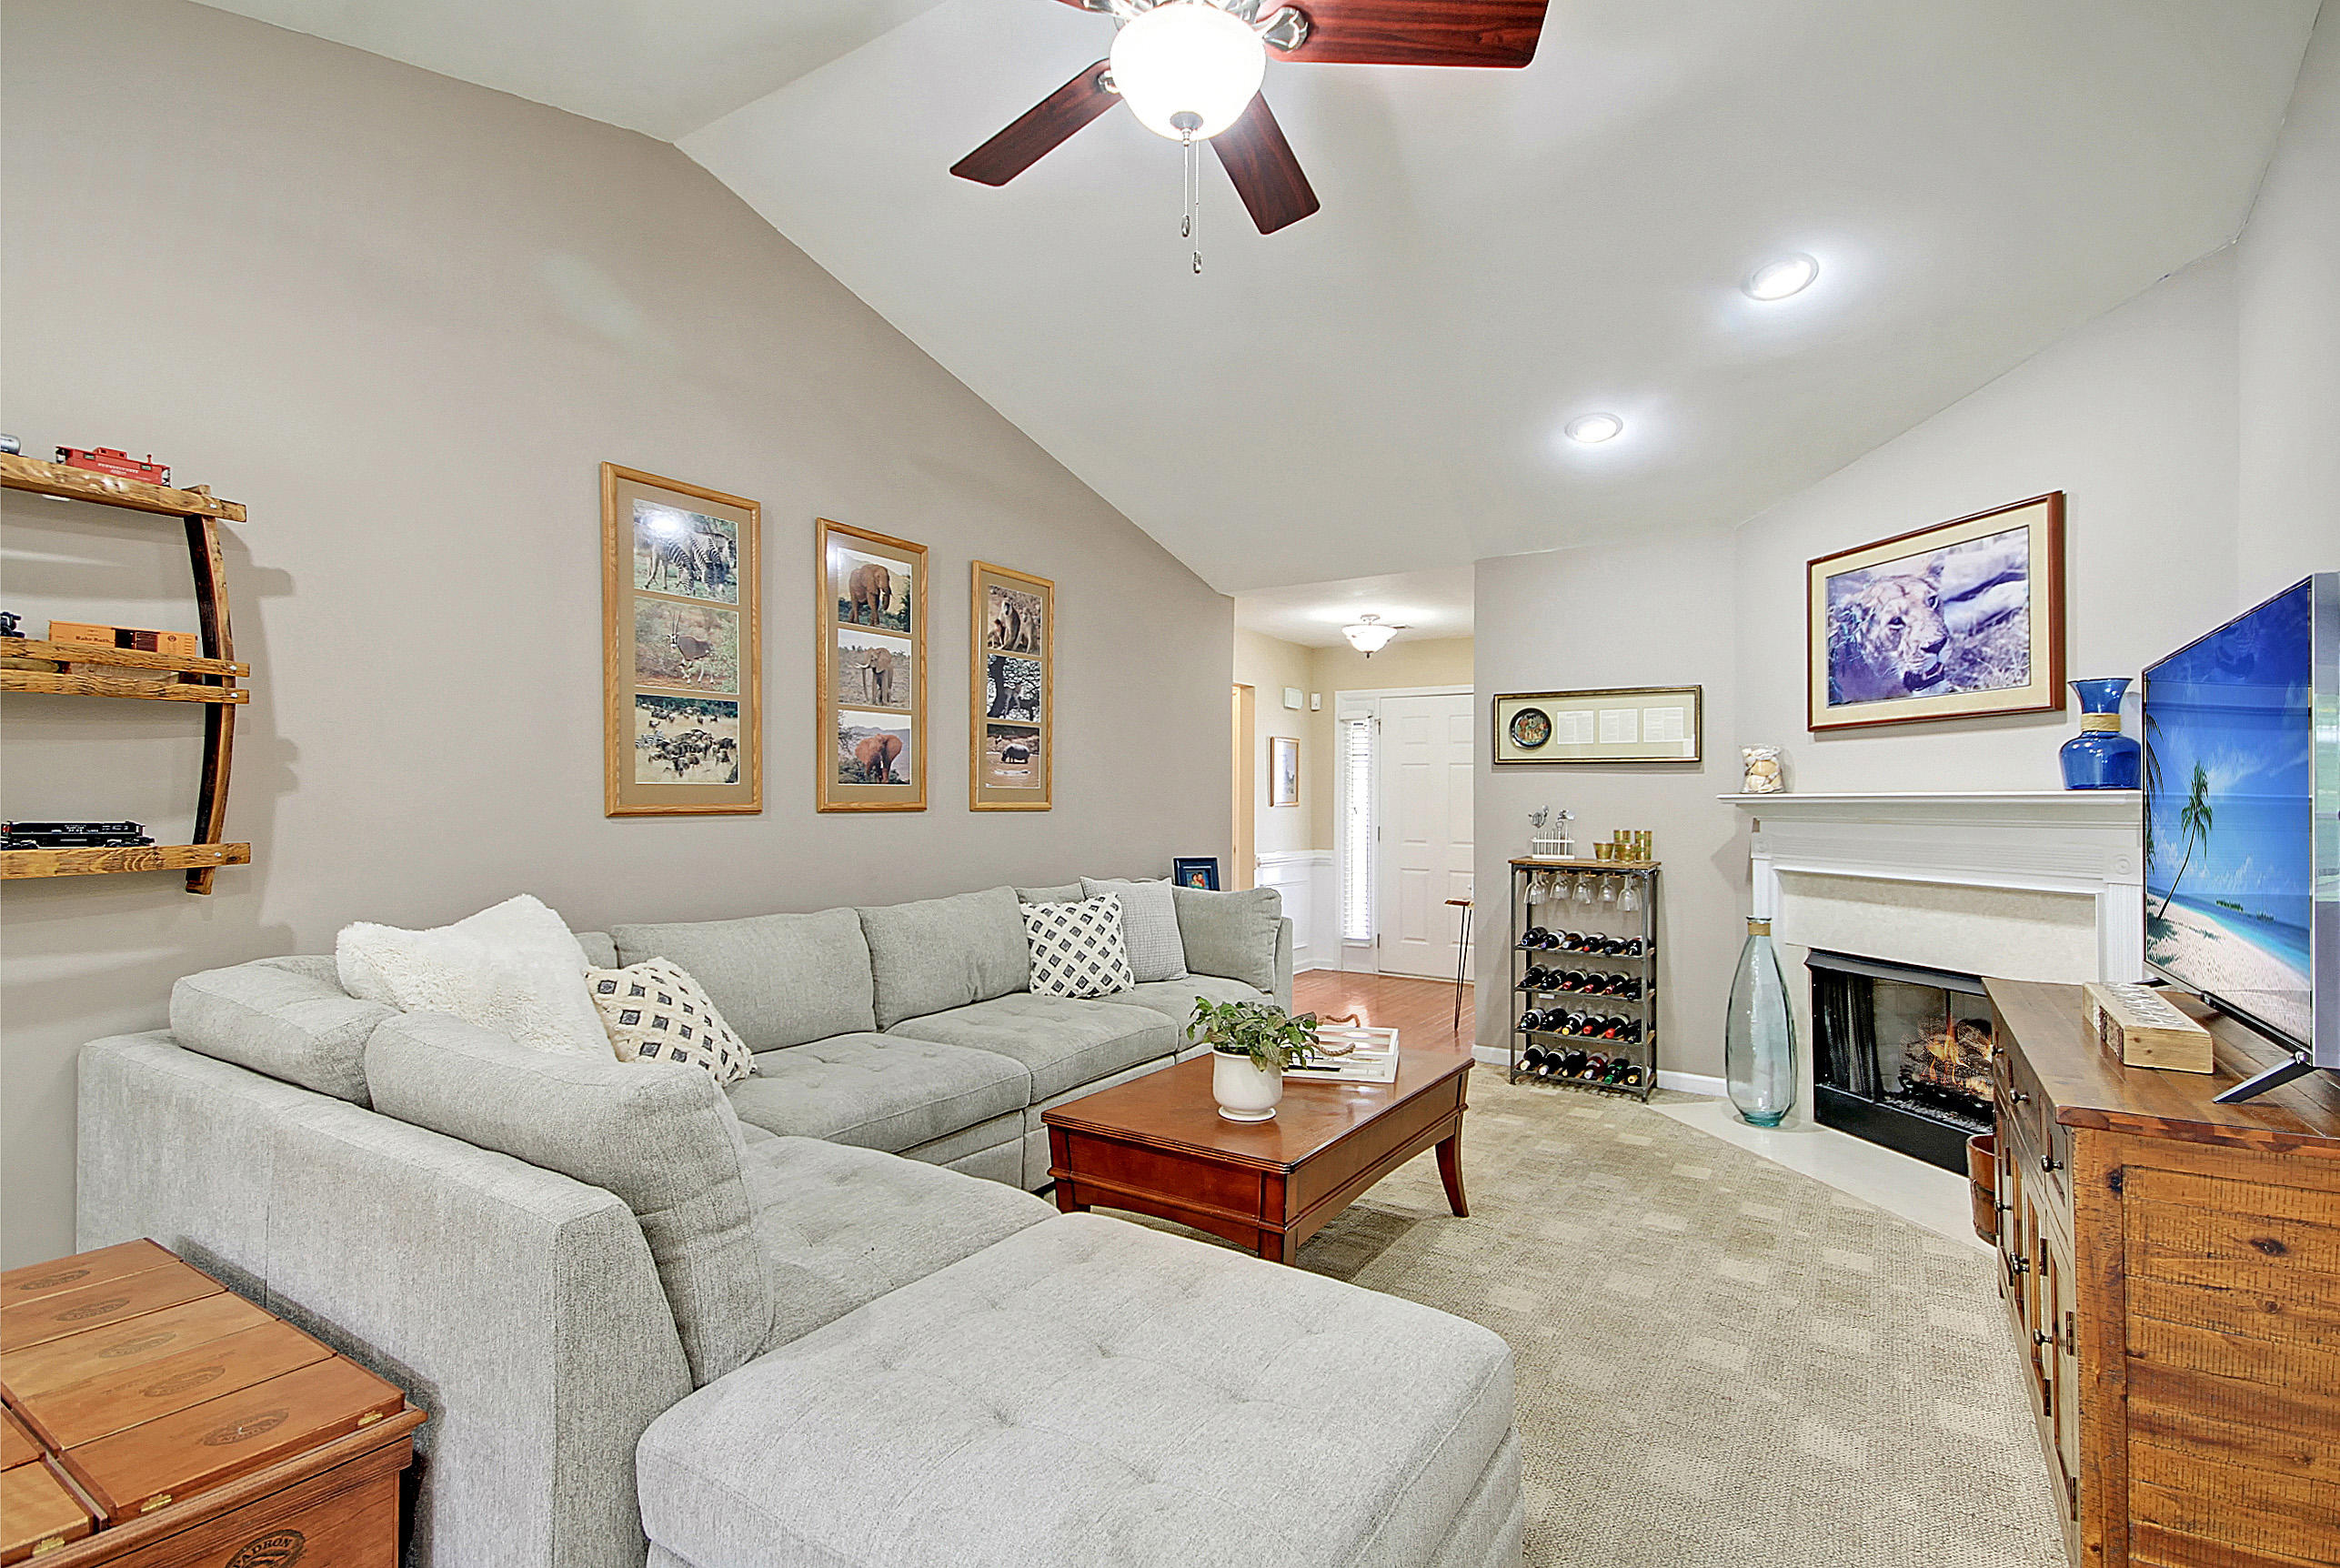 Park West Homes For Sale - 1460 Wellesley, Mount Pleasant, SC - 4